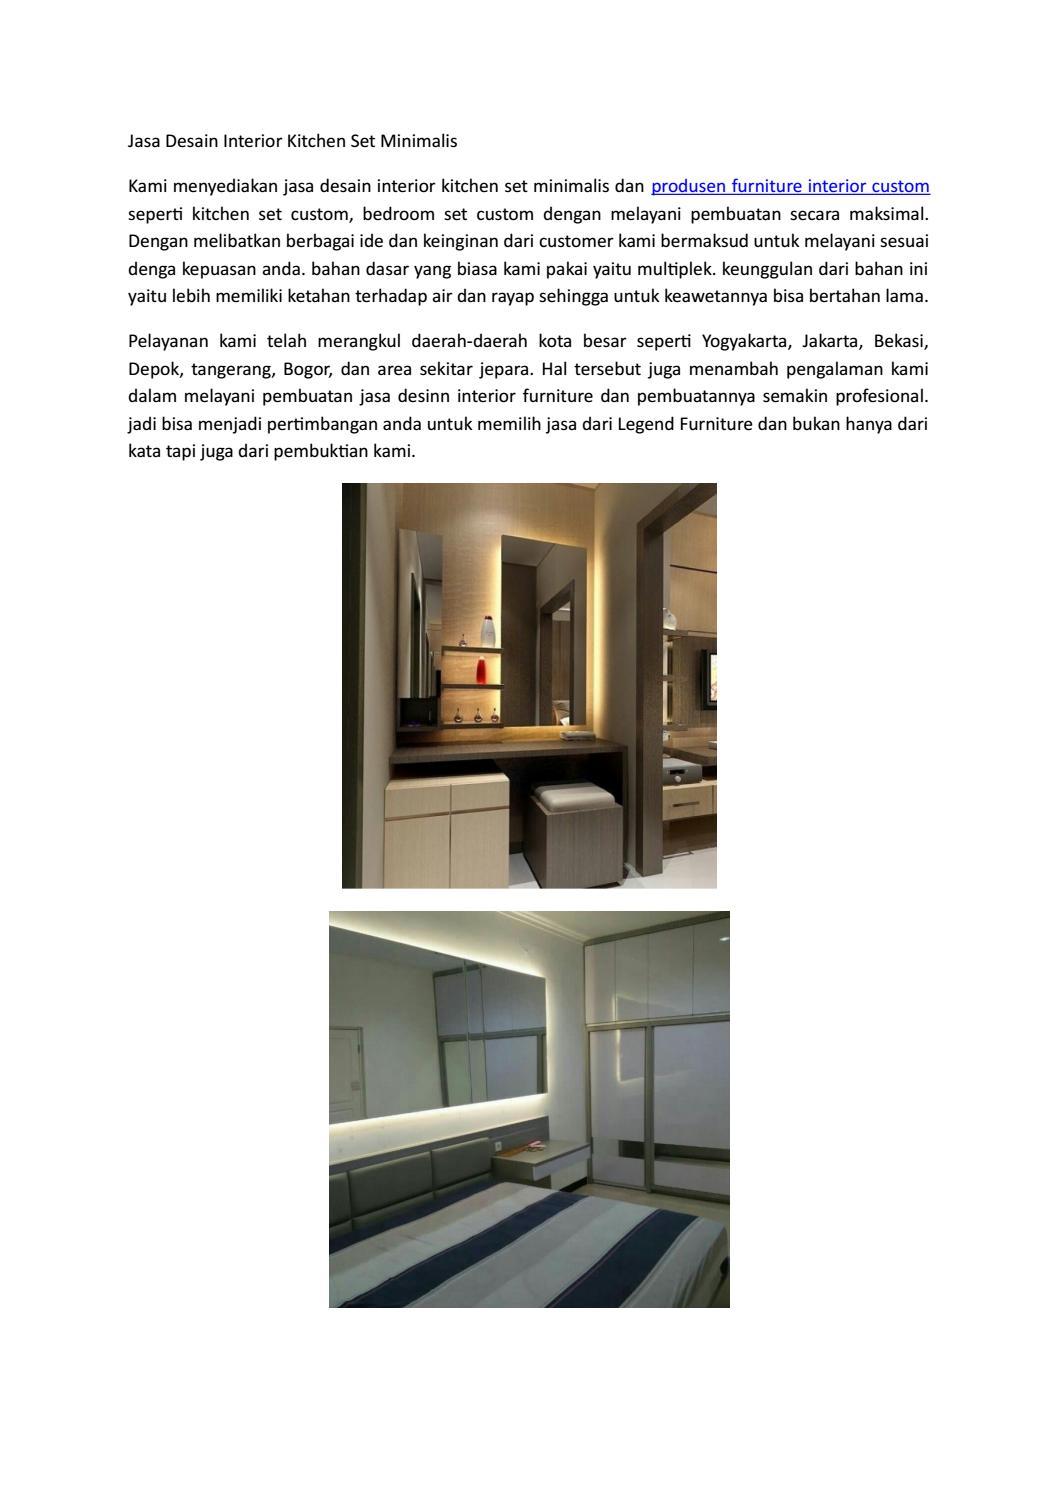 Jasa desain interior kitchen set minimalis by produsenfurniture982 issuu